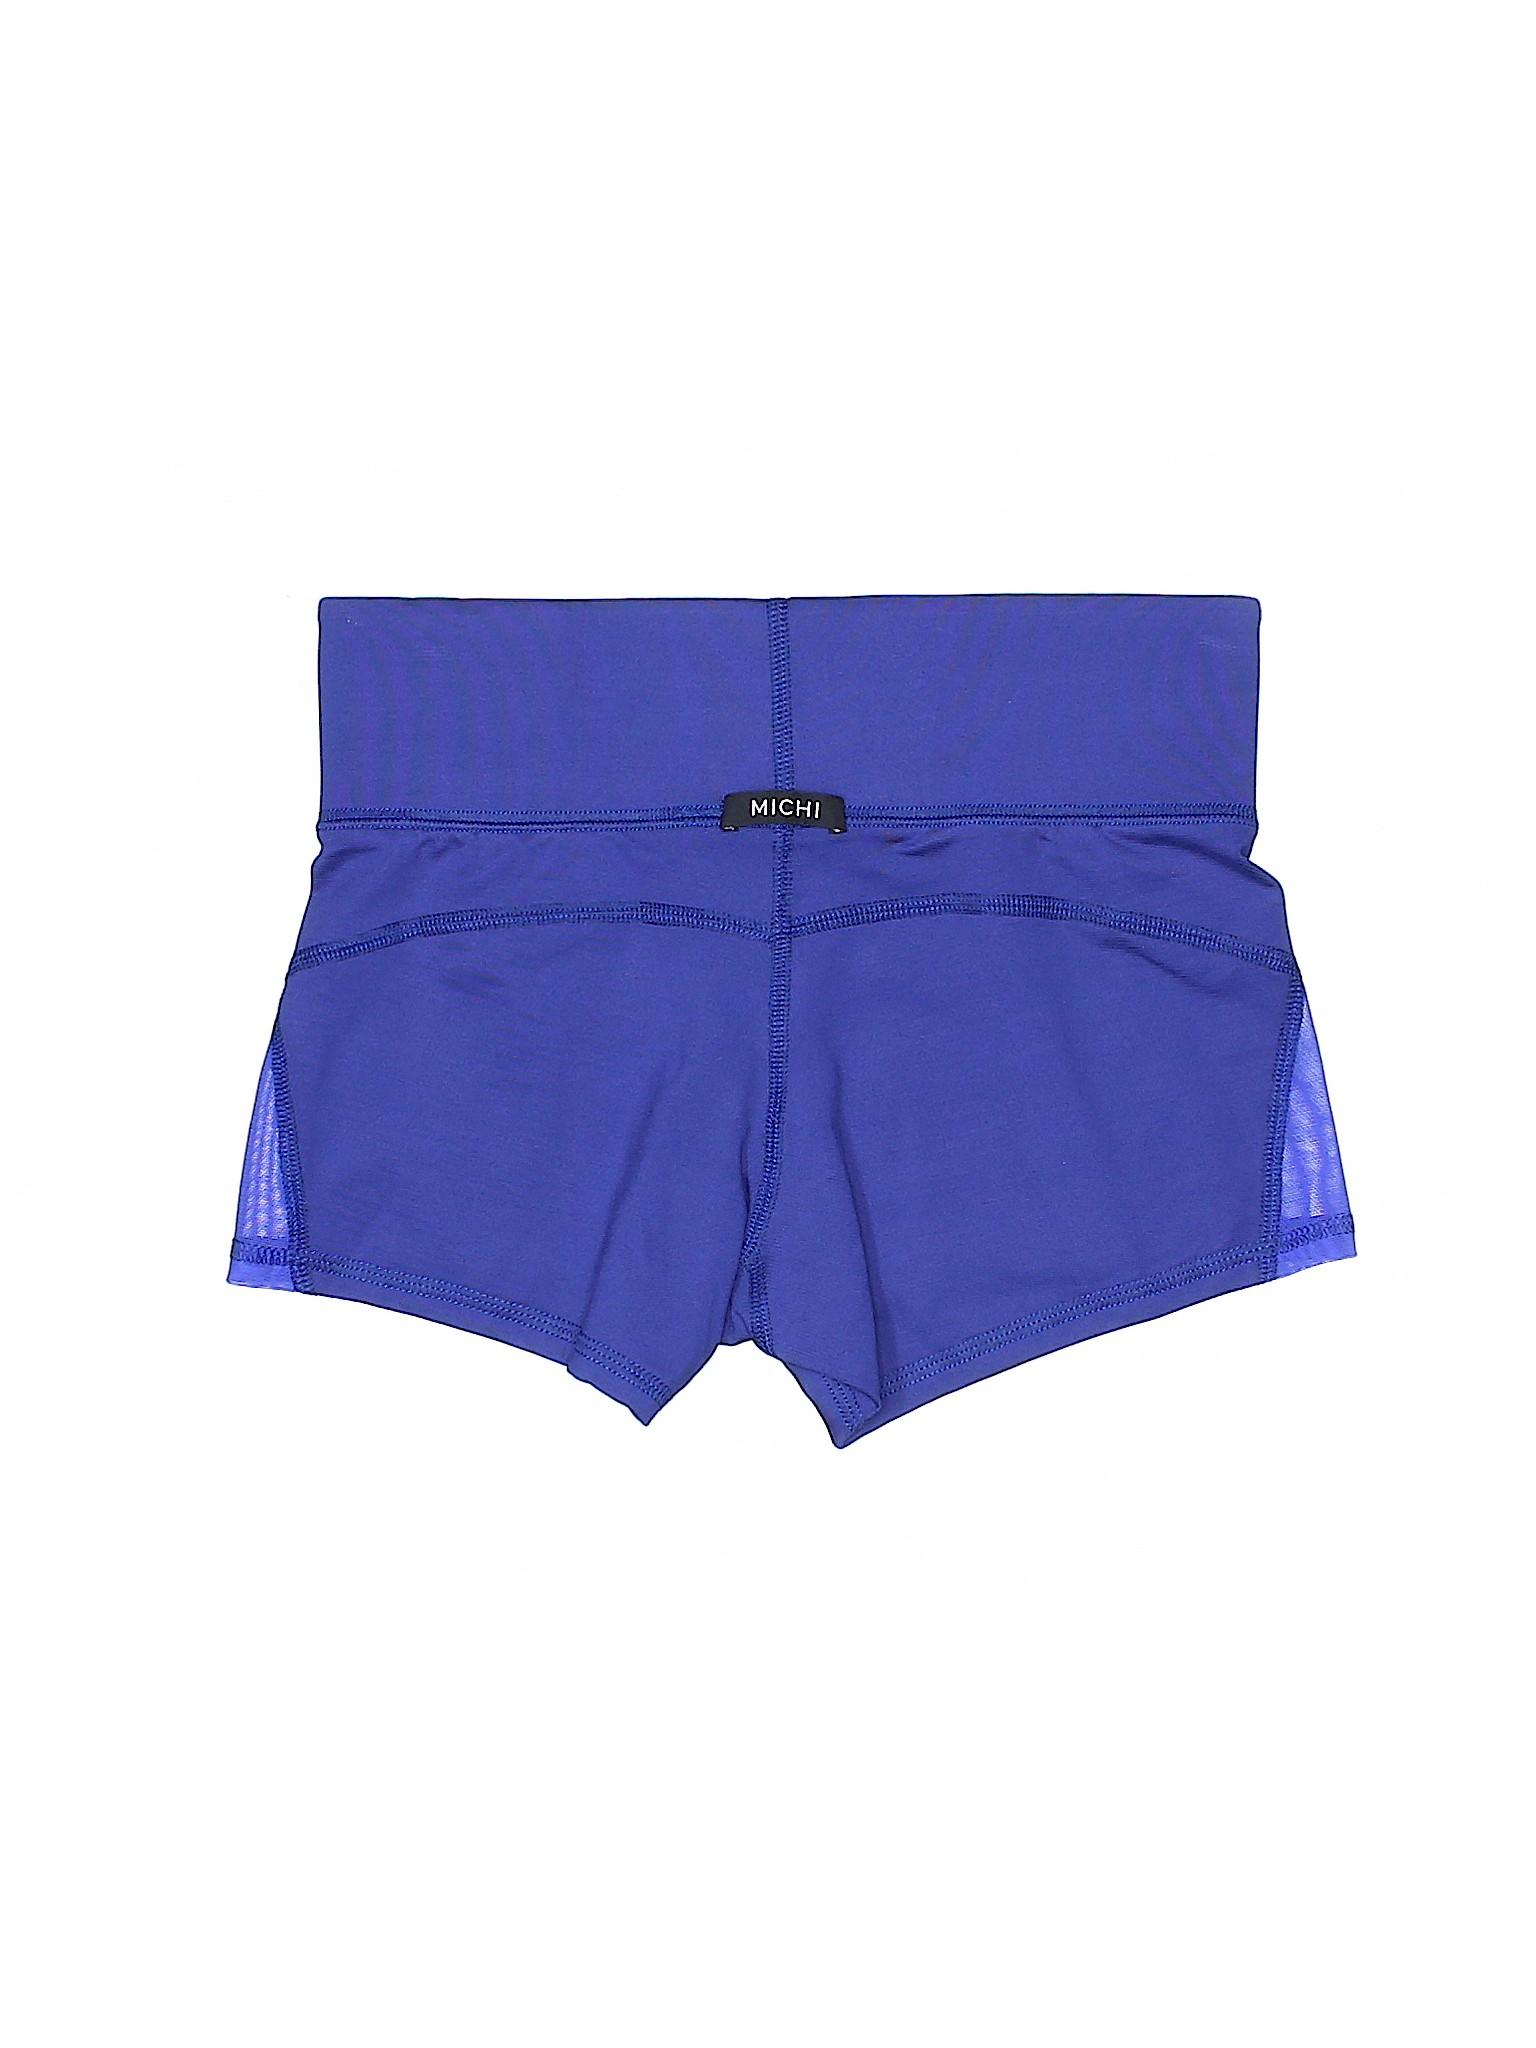 Leisure Michi Leisure Shorts Michi winter winter Athletic Shorts Athletic Leisure rqtEgrw